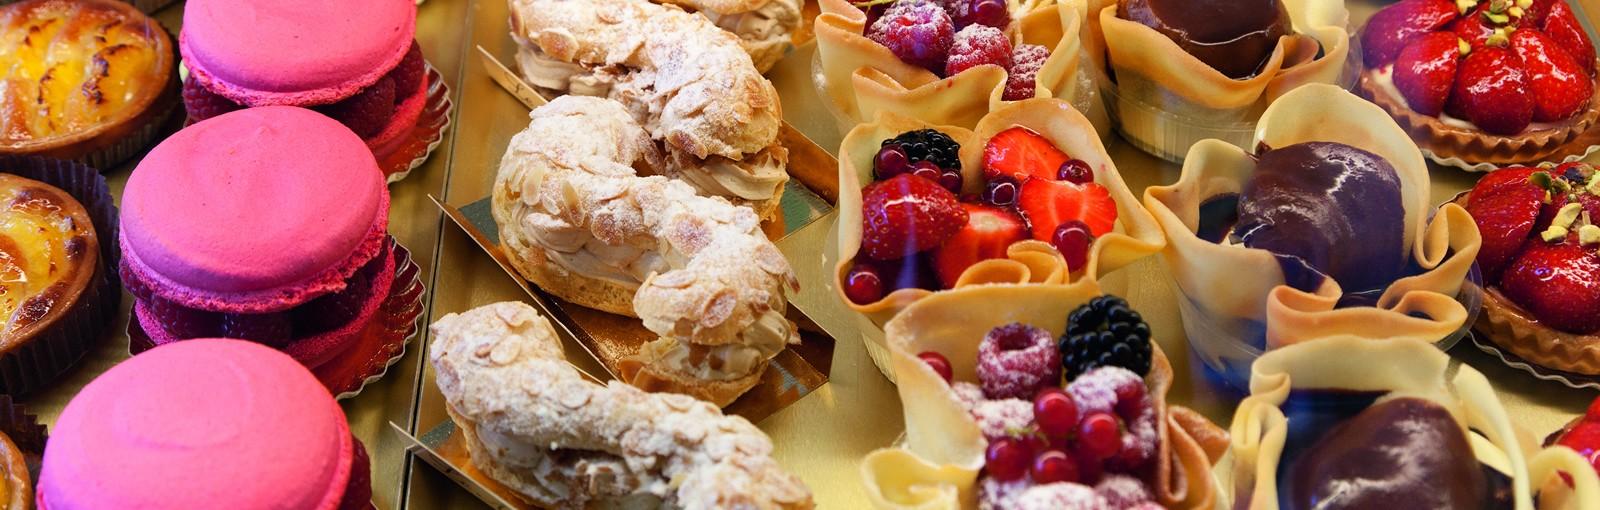 Tours 拉丁区的美食盛宴 - 徒步游 - 巴黎游